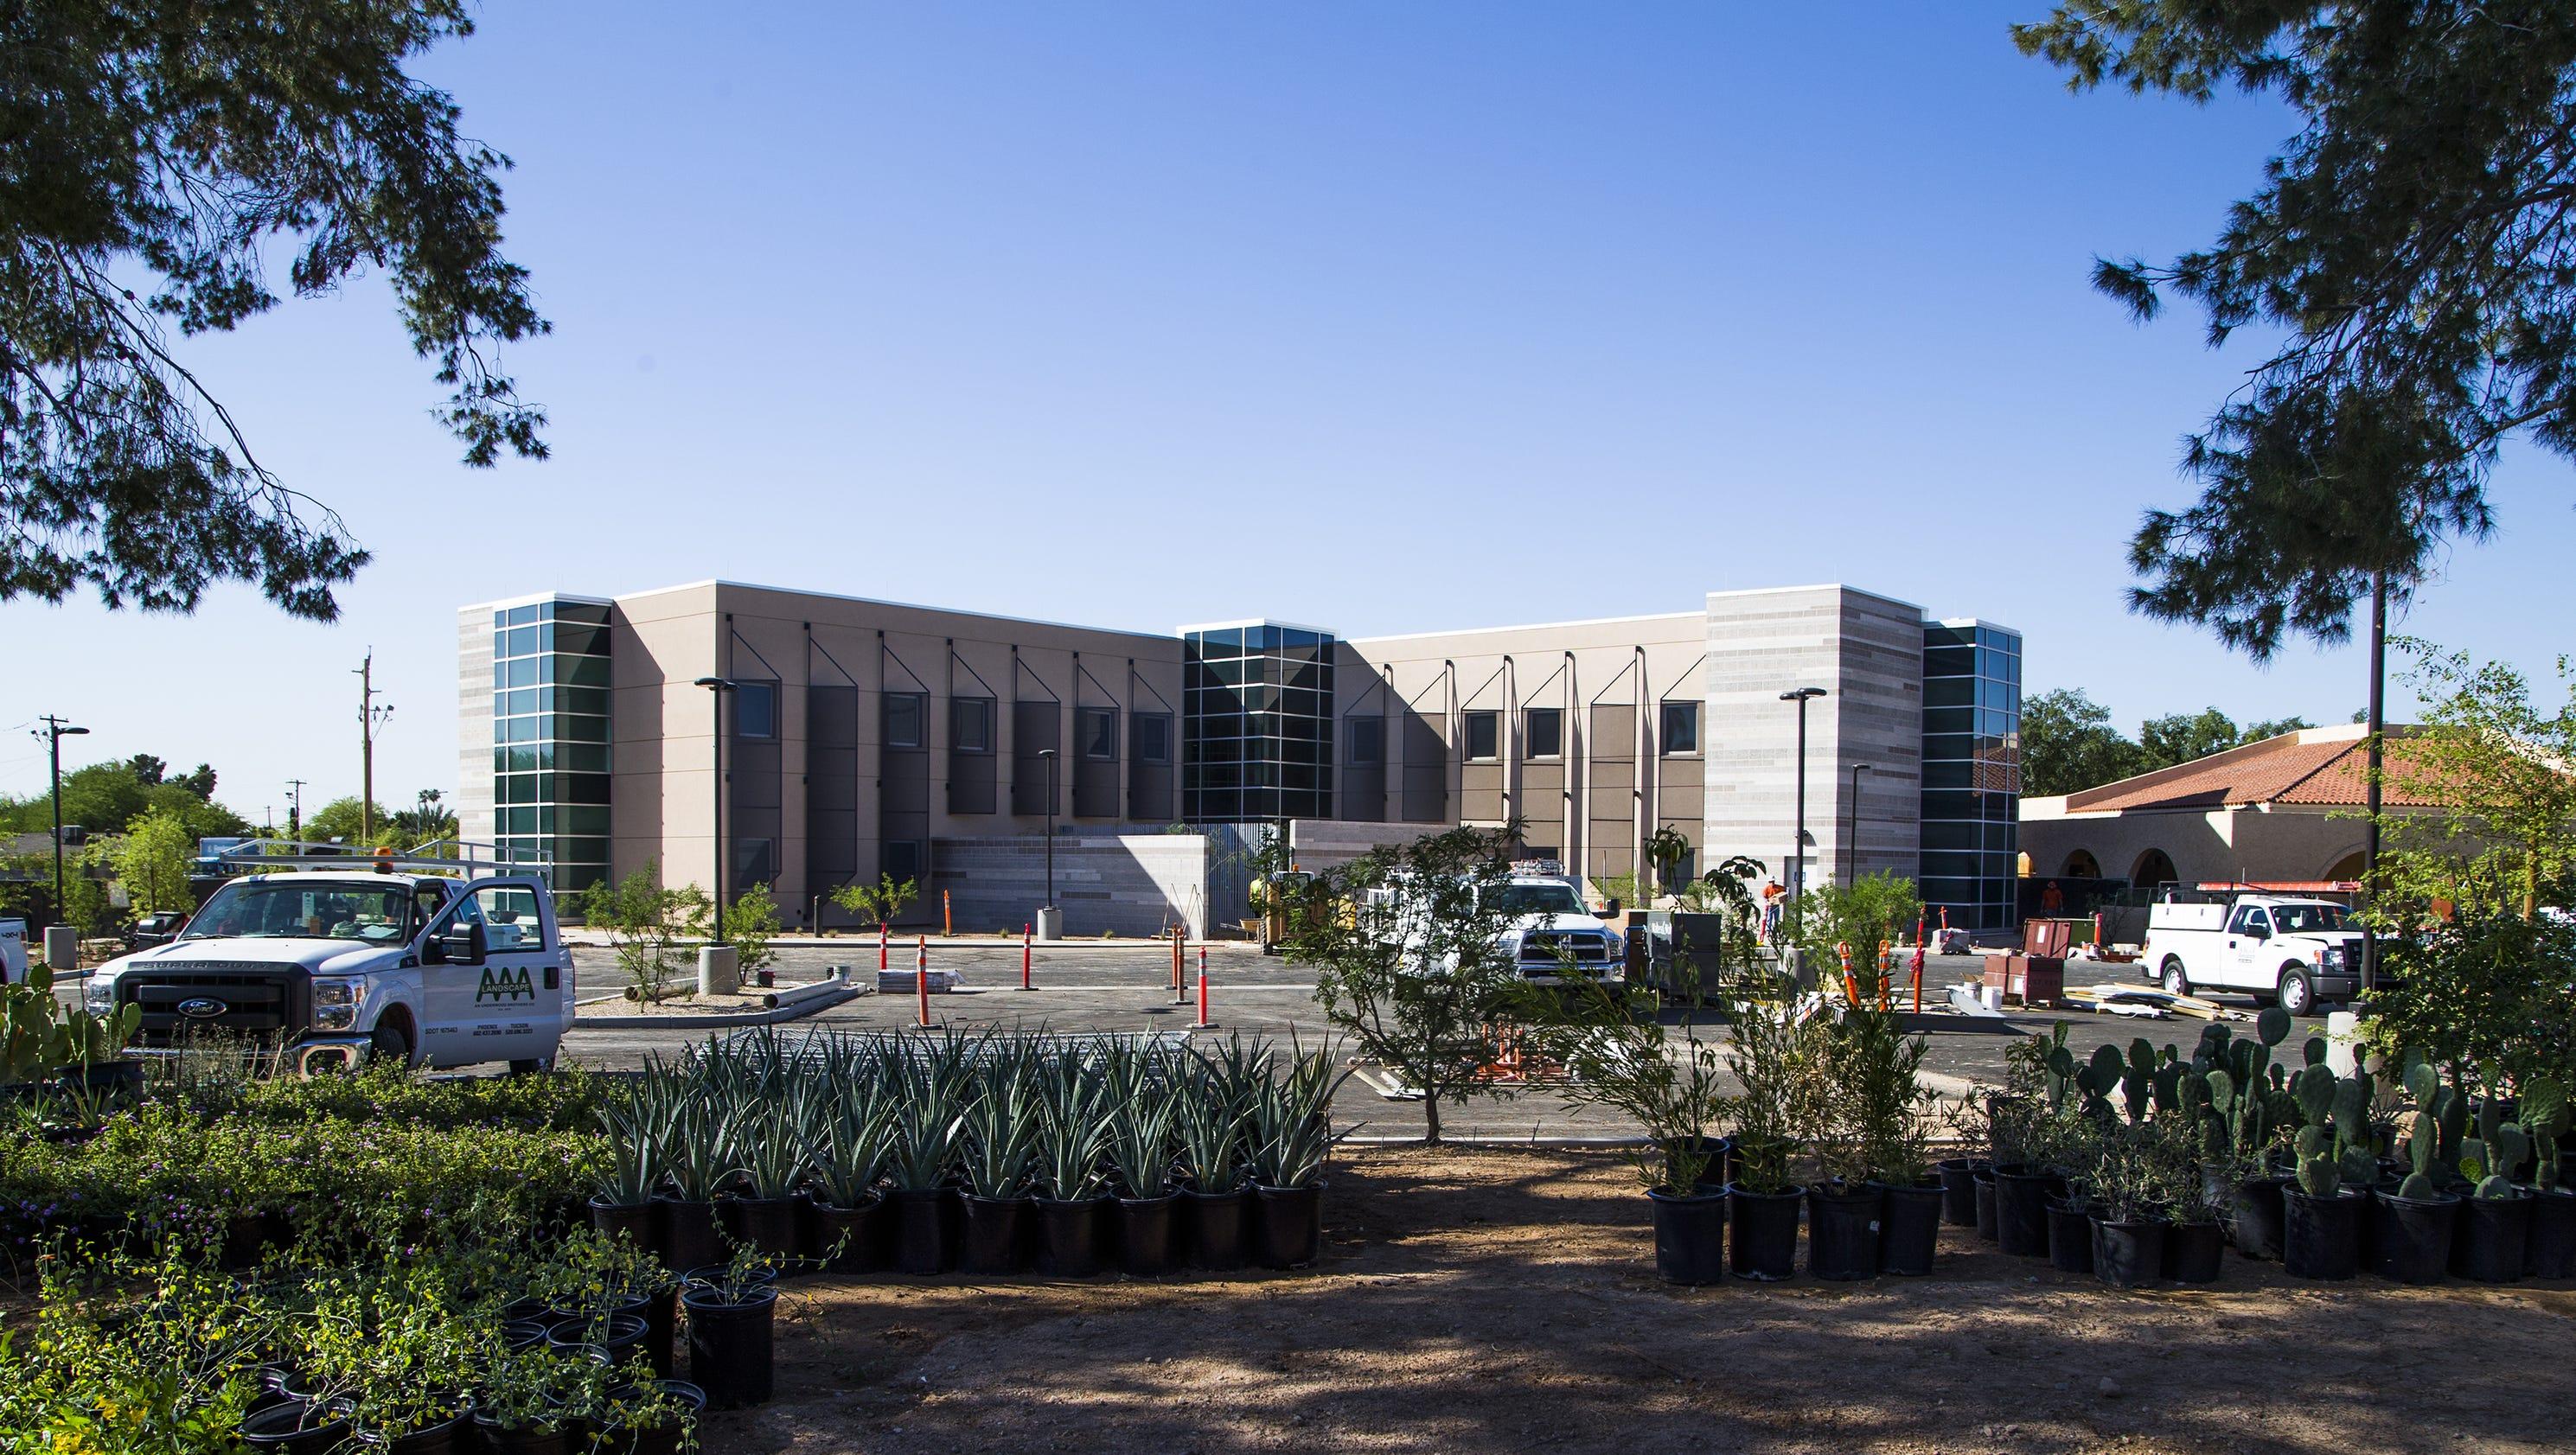 Helping Healing Banner Upgrades Scottsdale Behavioral Health Hospital